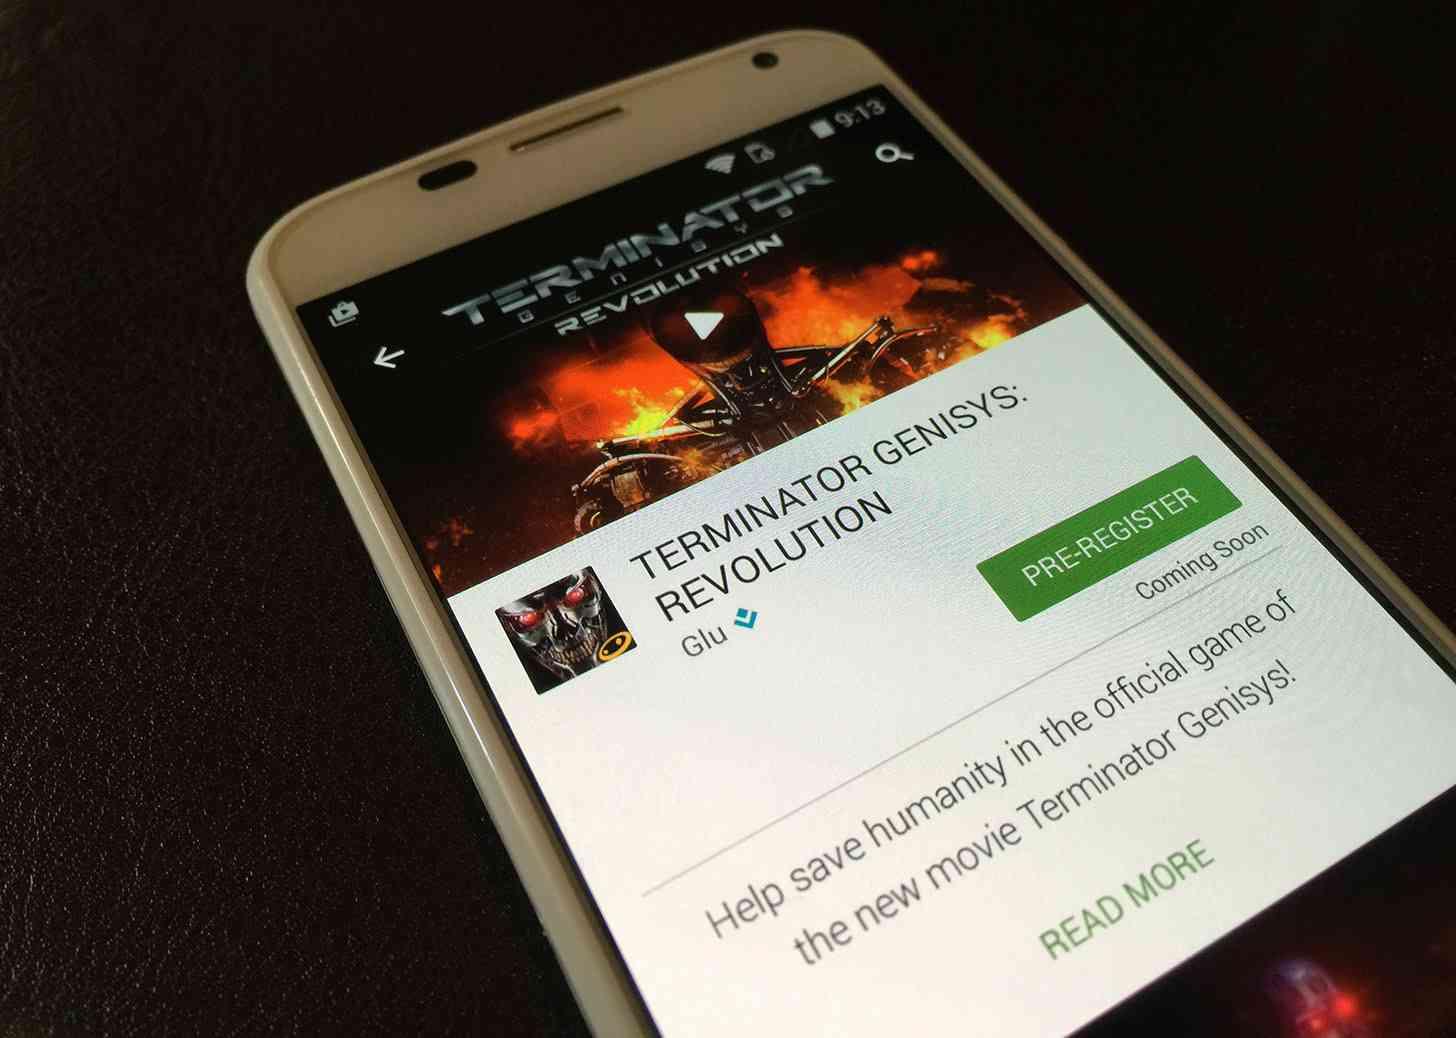 Terminator Genisys: Revolution Google Play pre-register